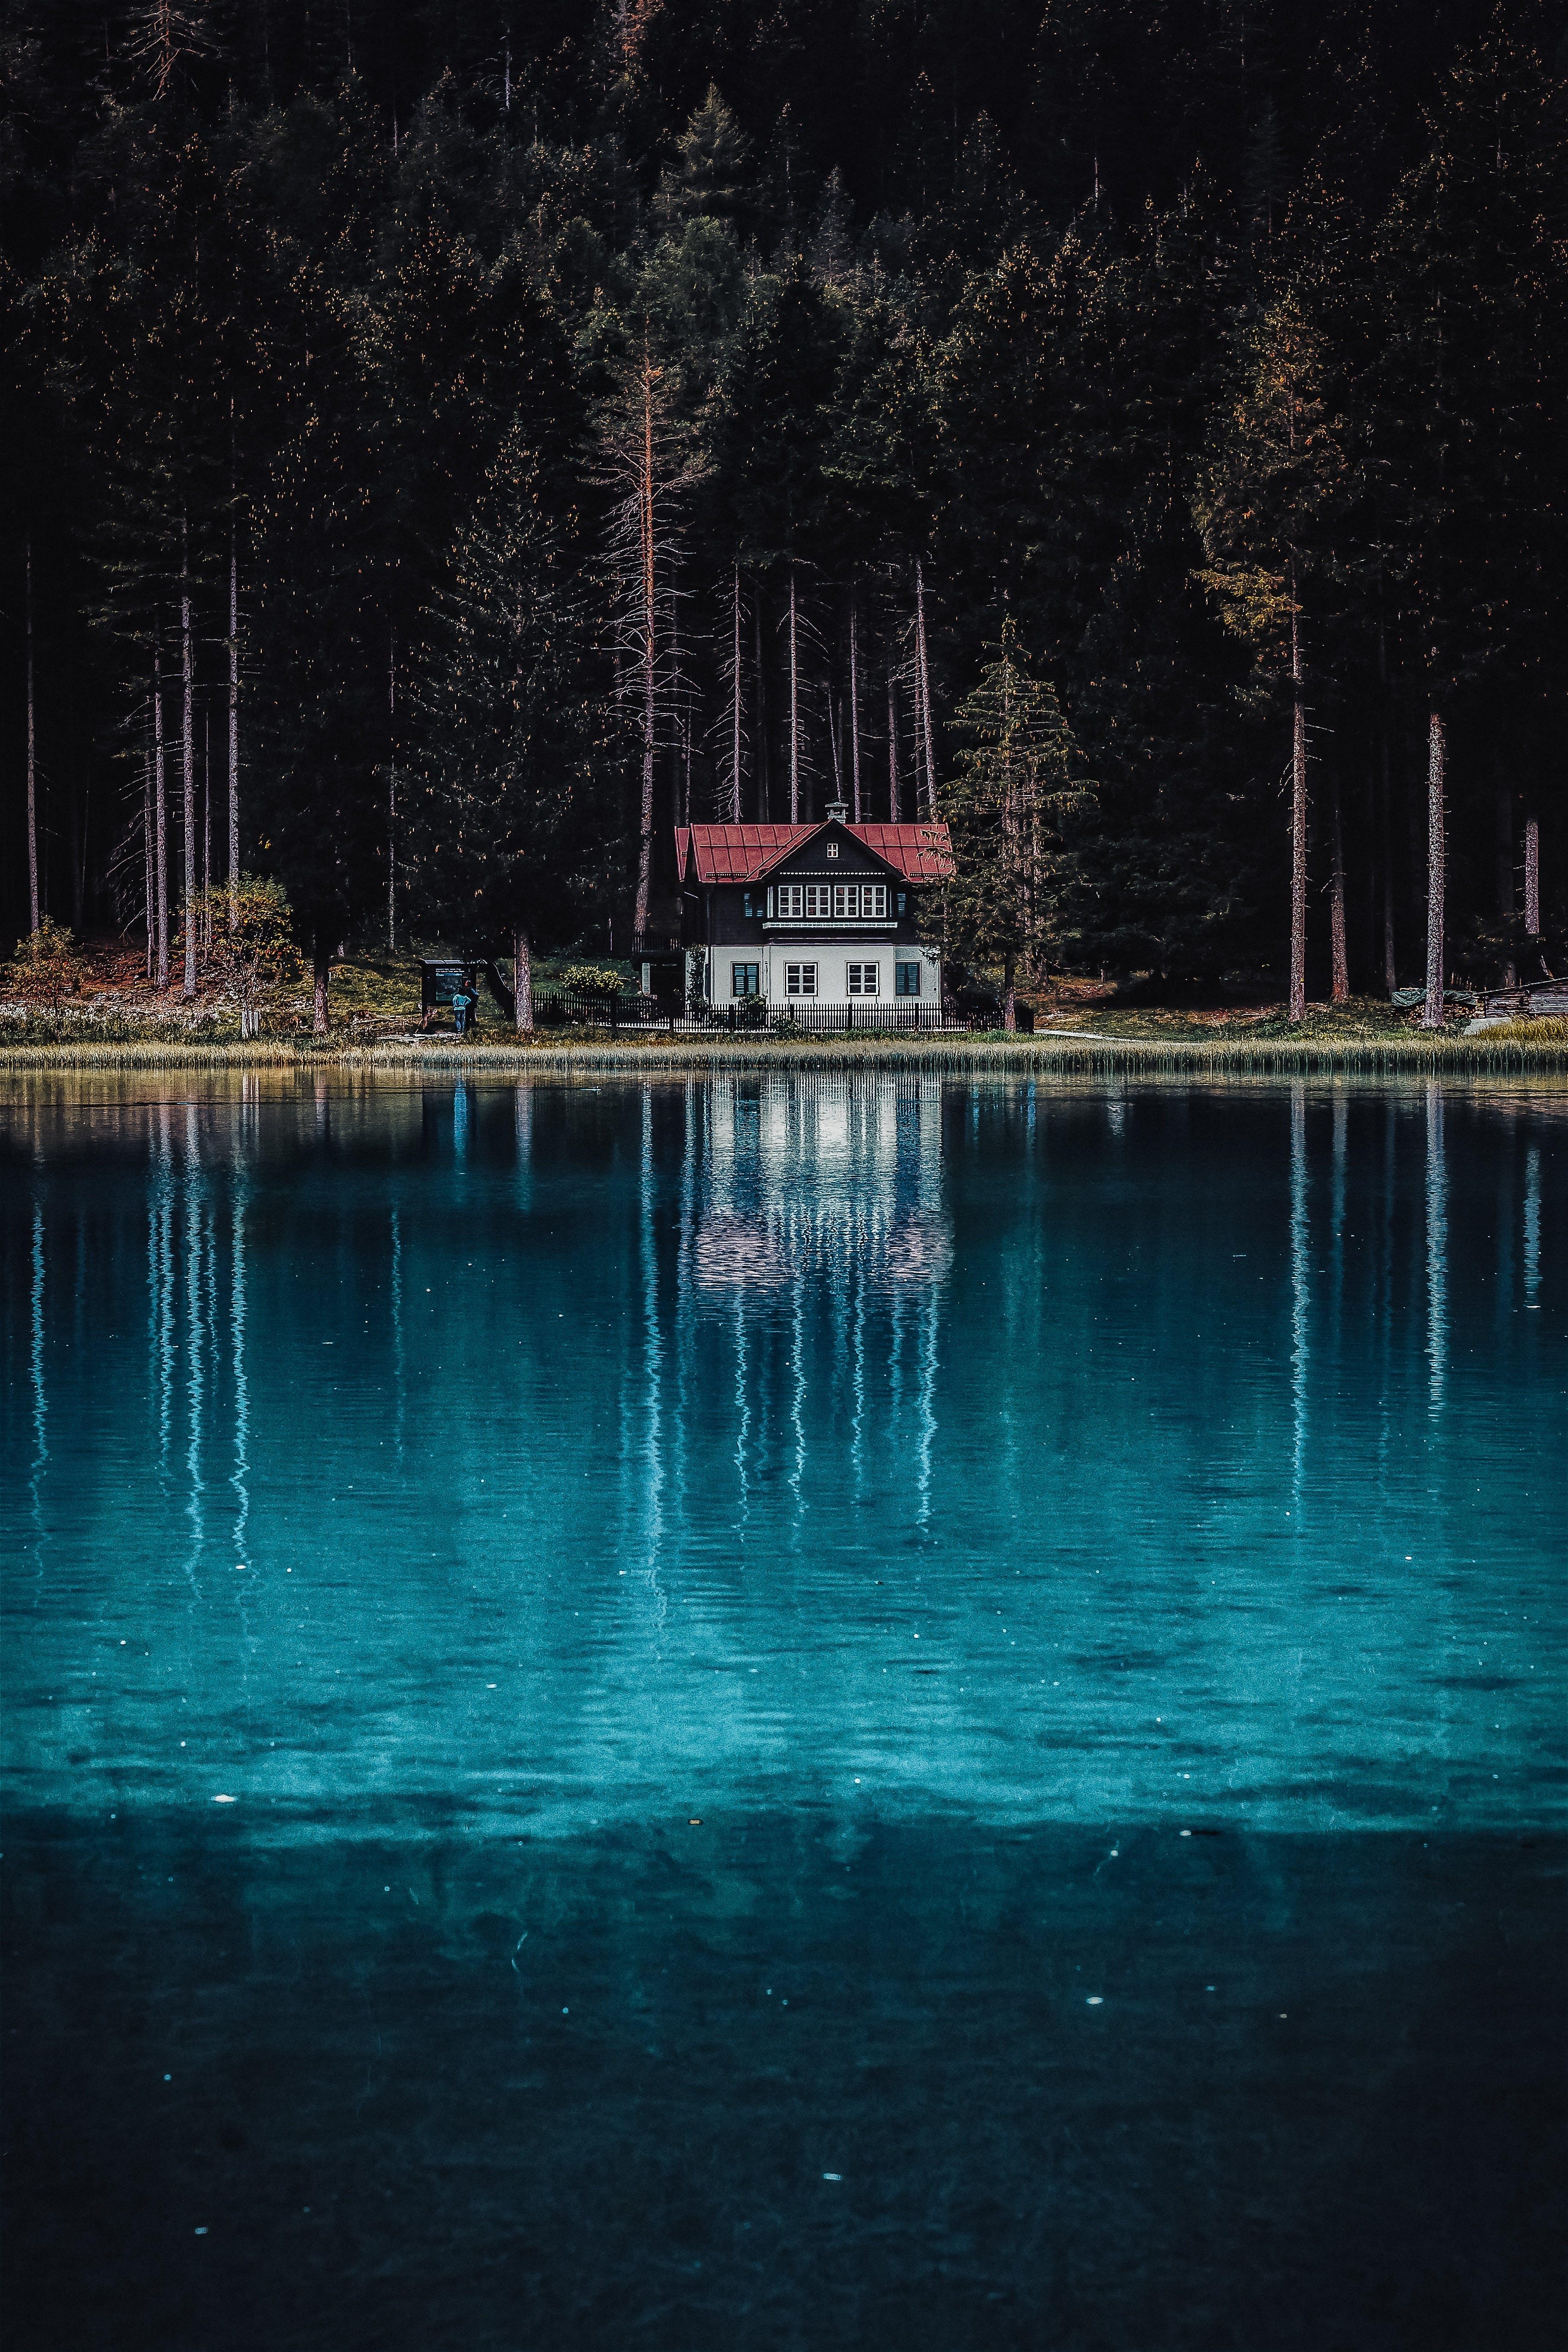 Foto stok gratis Arsitektur, danau, refleksi, rumah